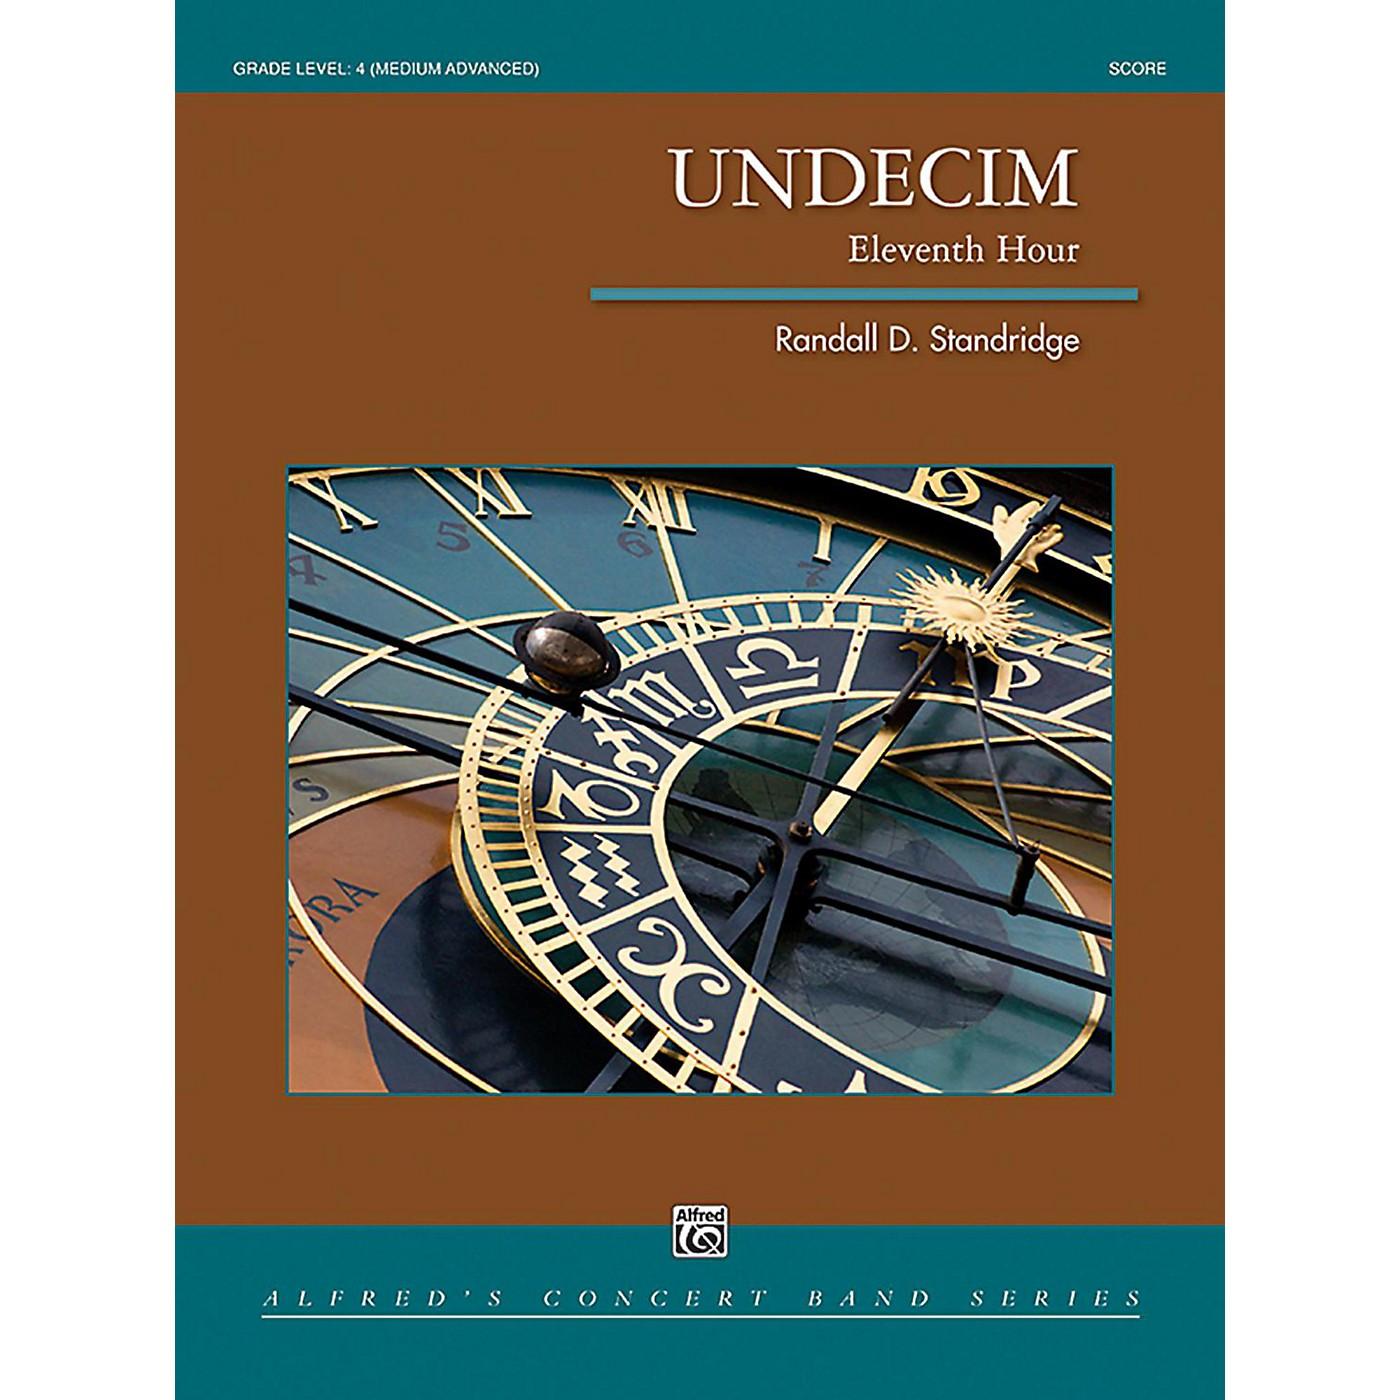 Alfred Undecim Concert Band Grade 4 (Medium Advanced) thumbnail